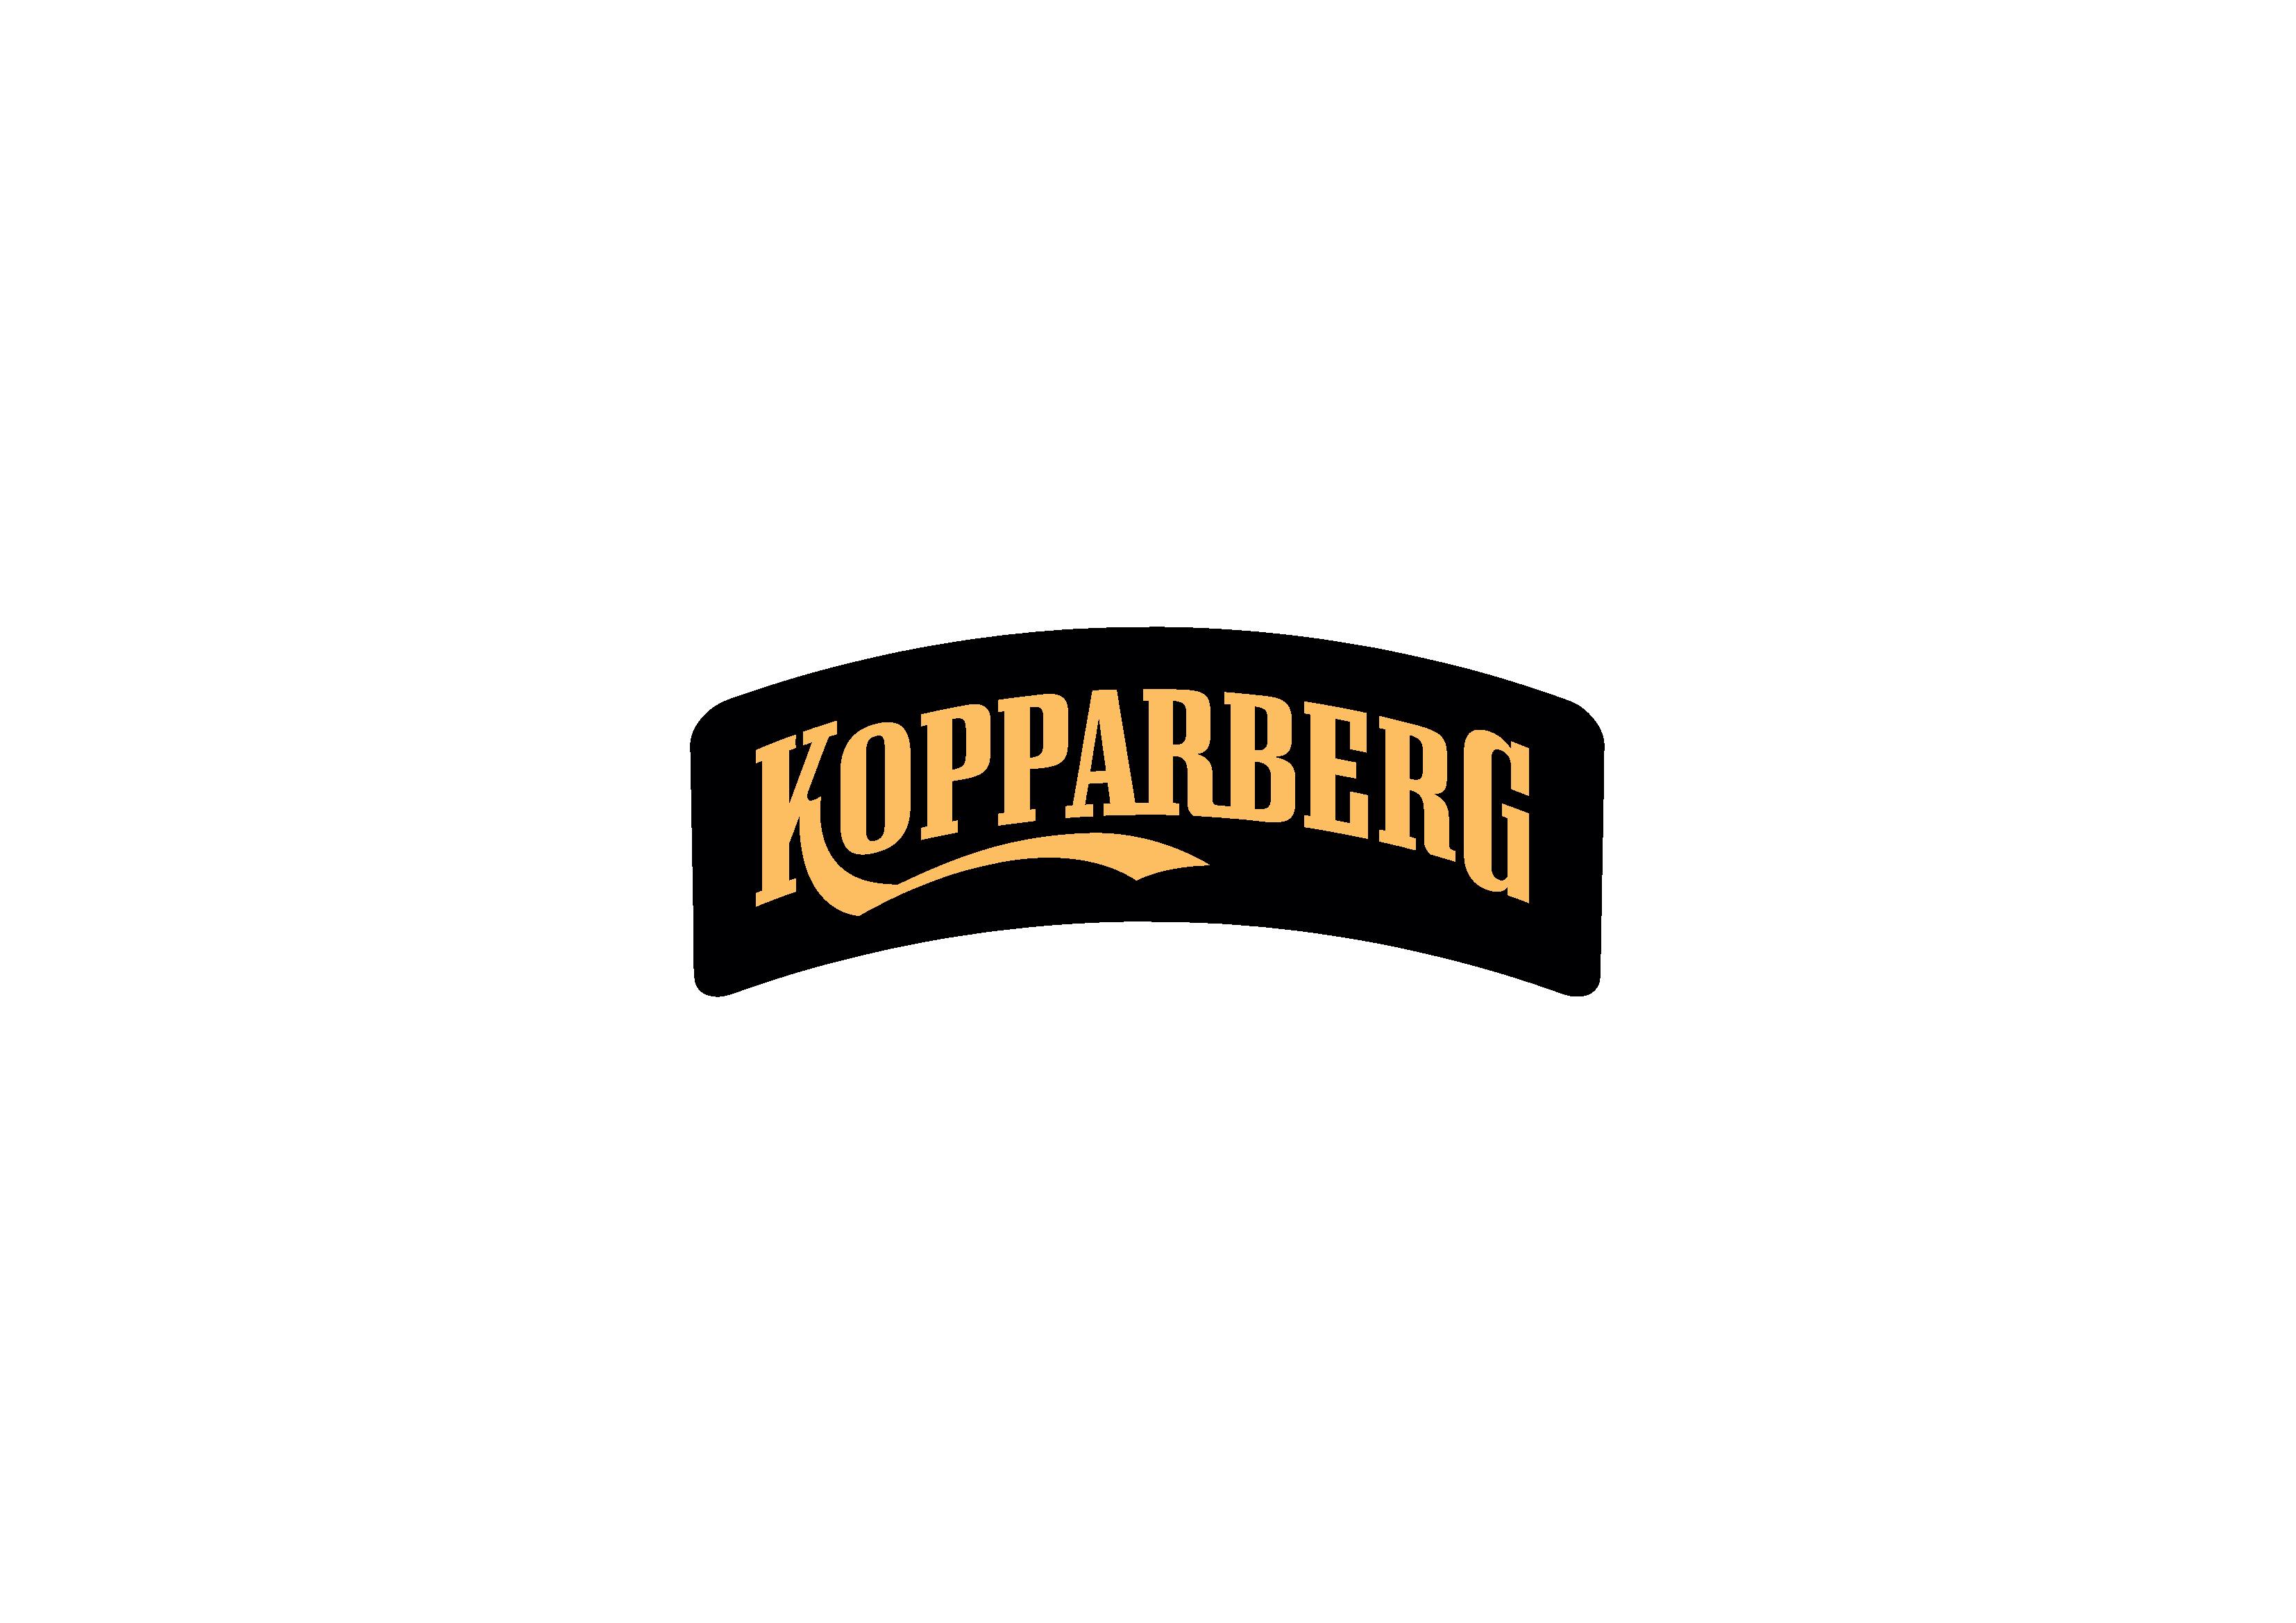 Kopparberg_Jellybean_logo